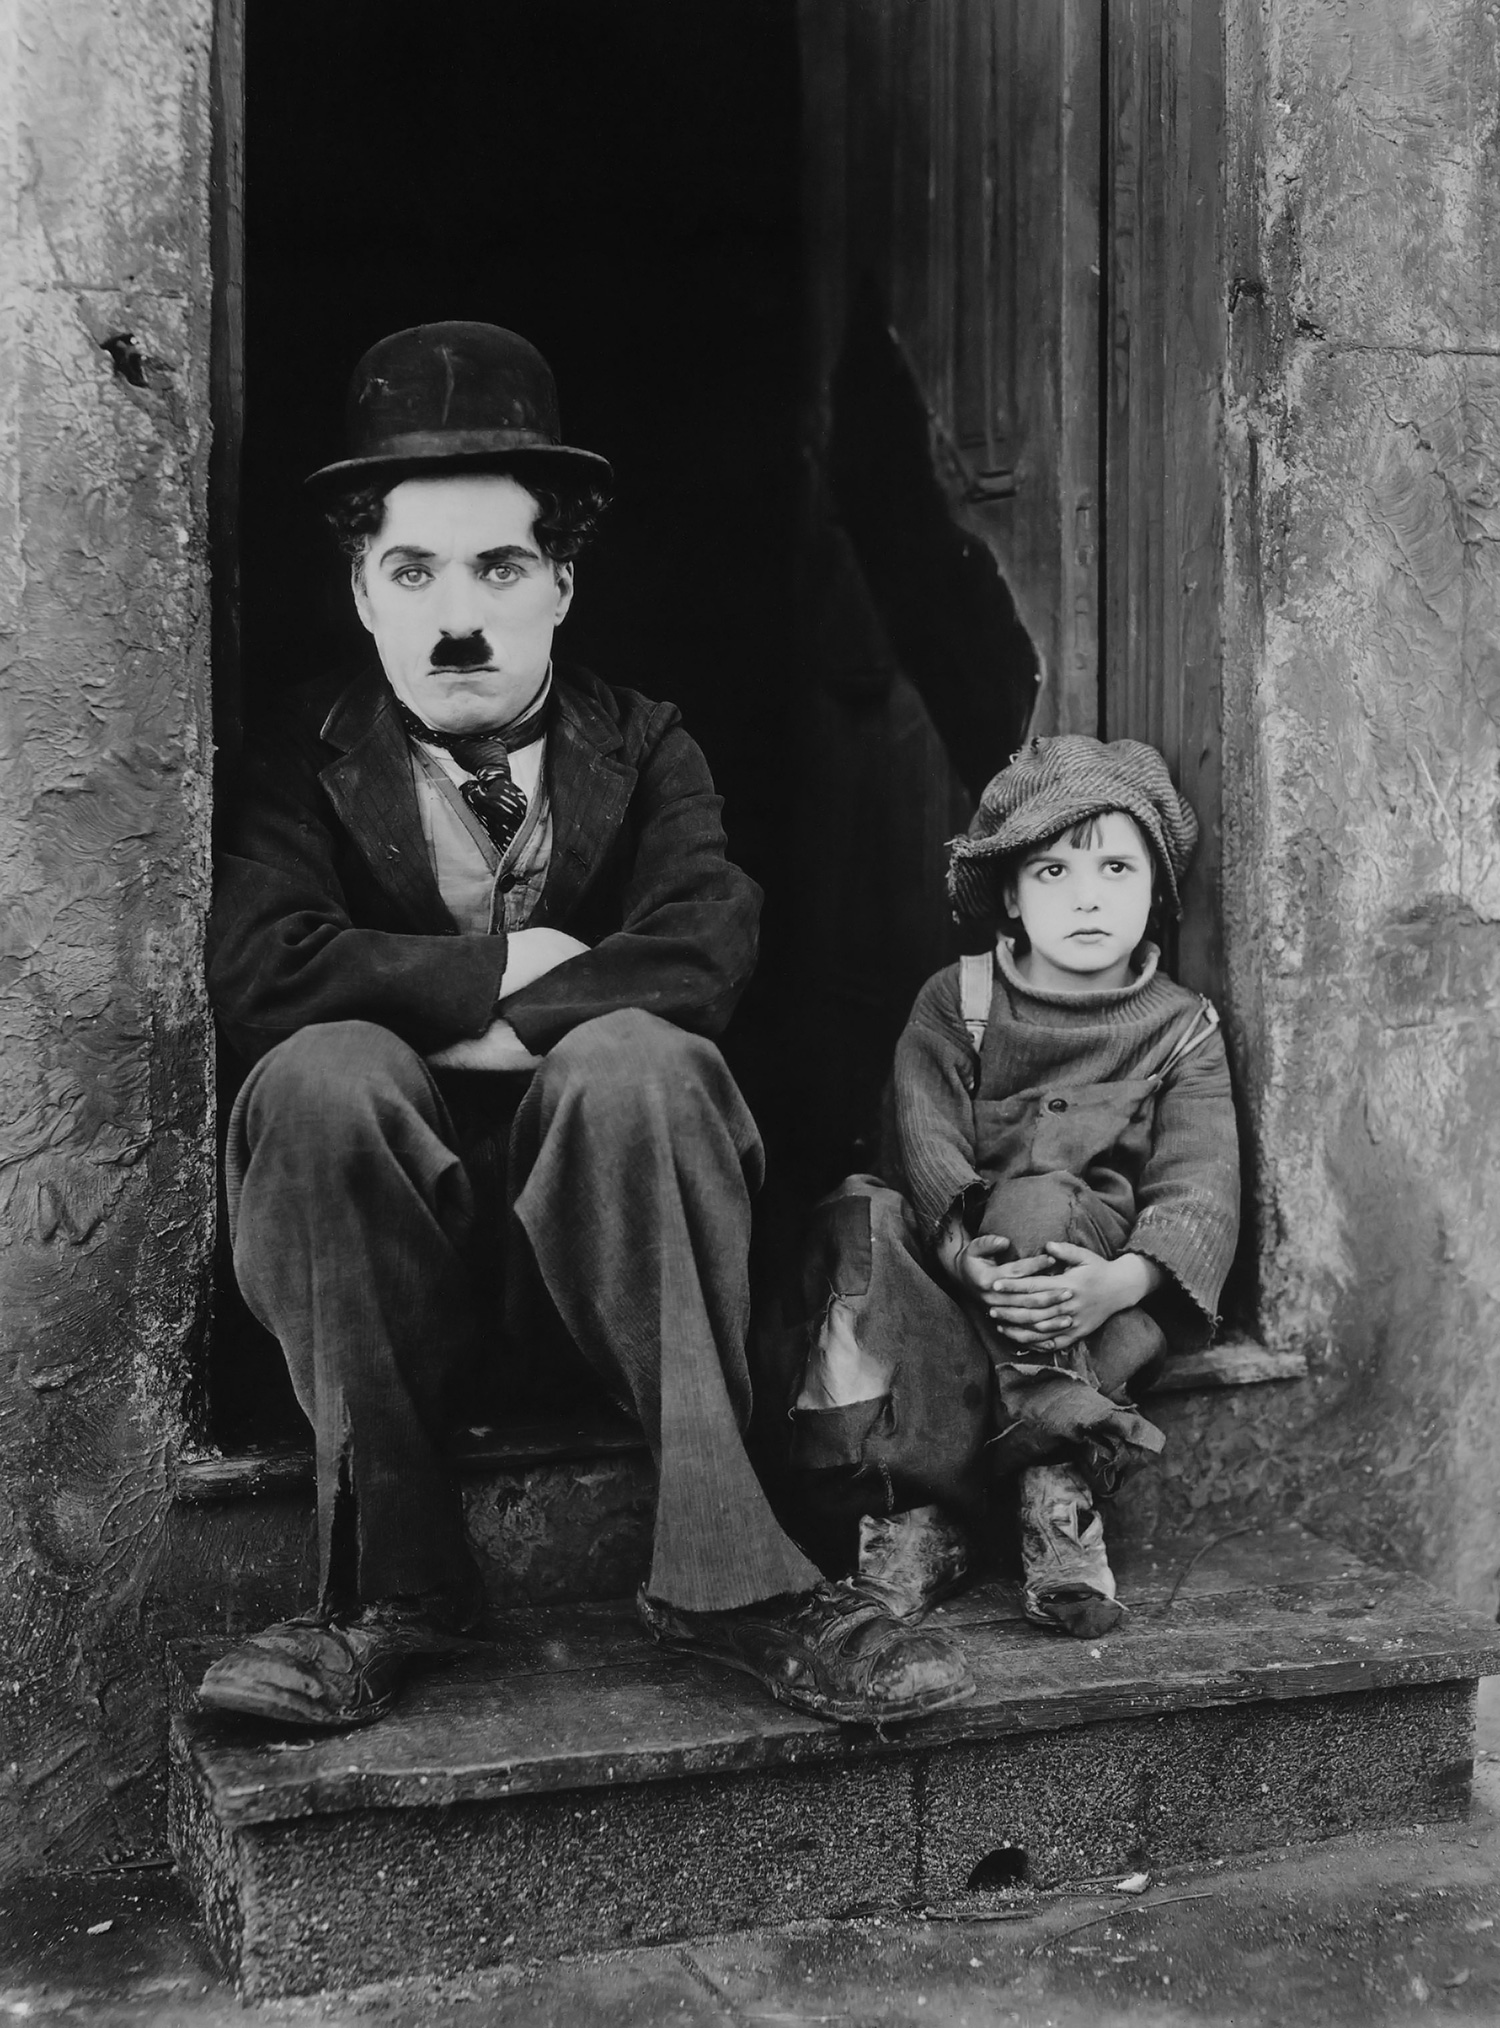 Image via Charlie Chaplin Productions